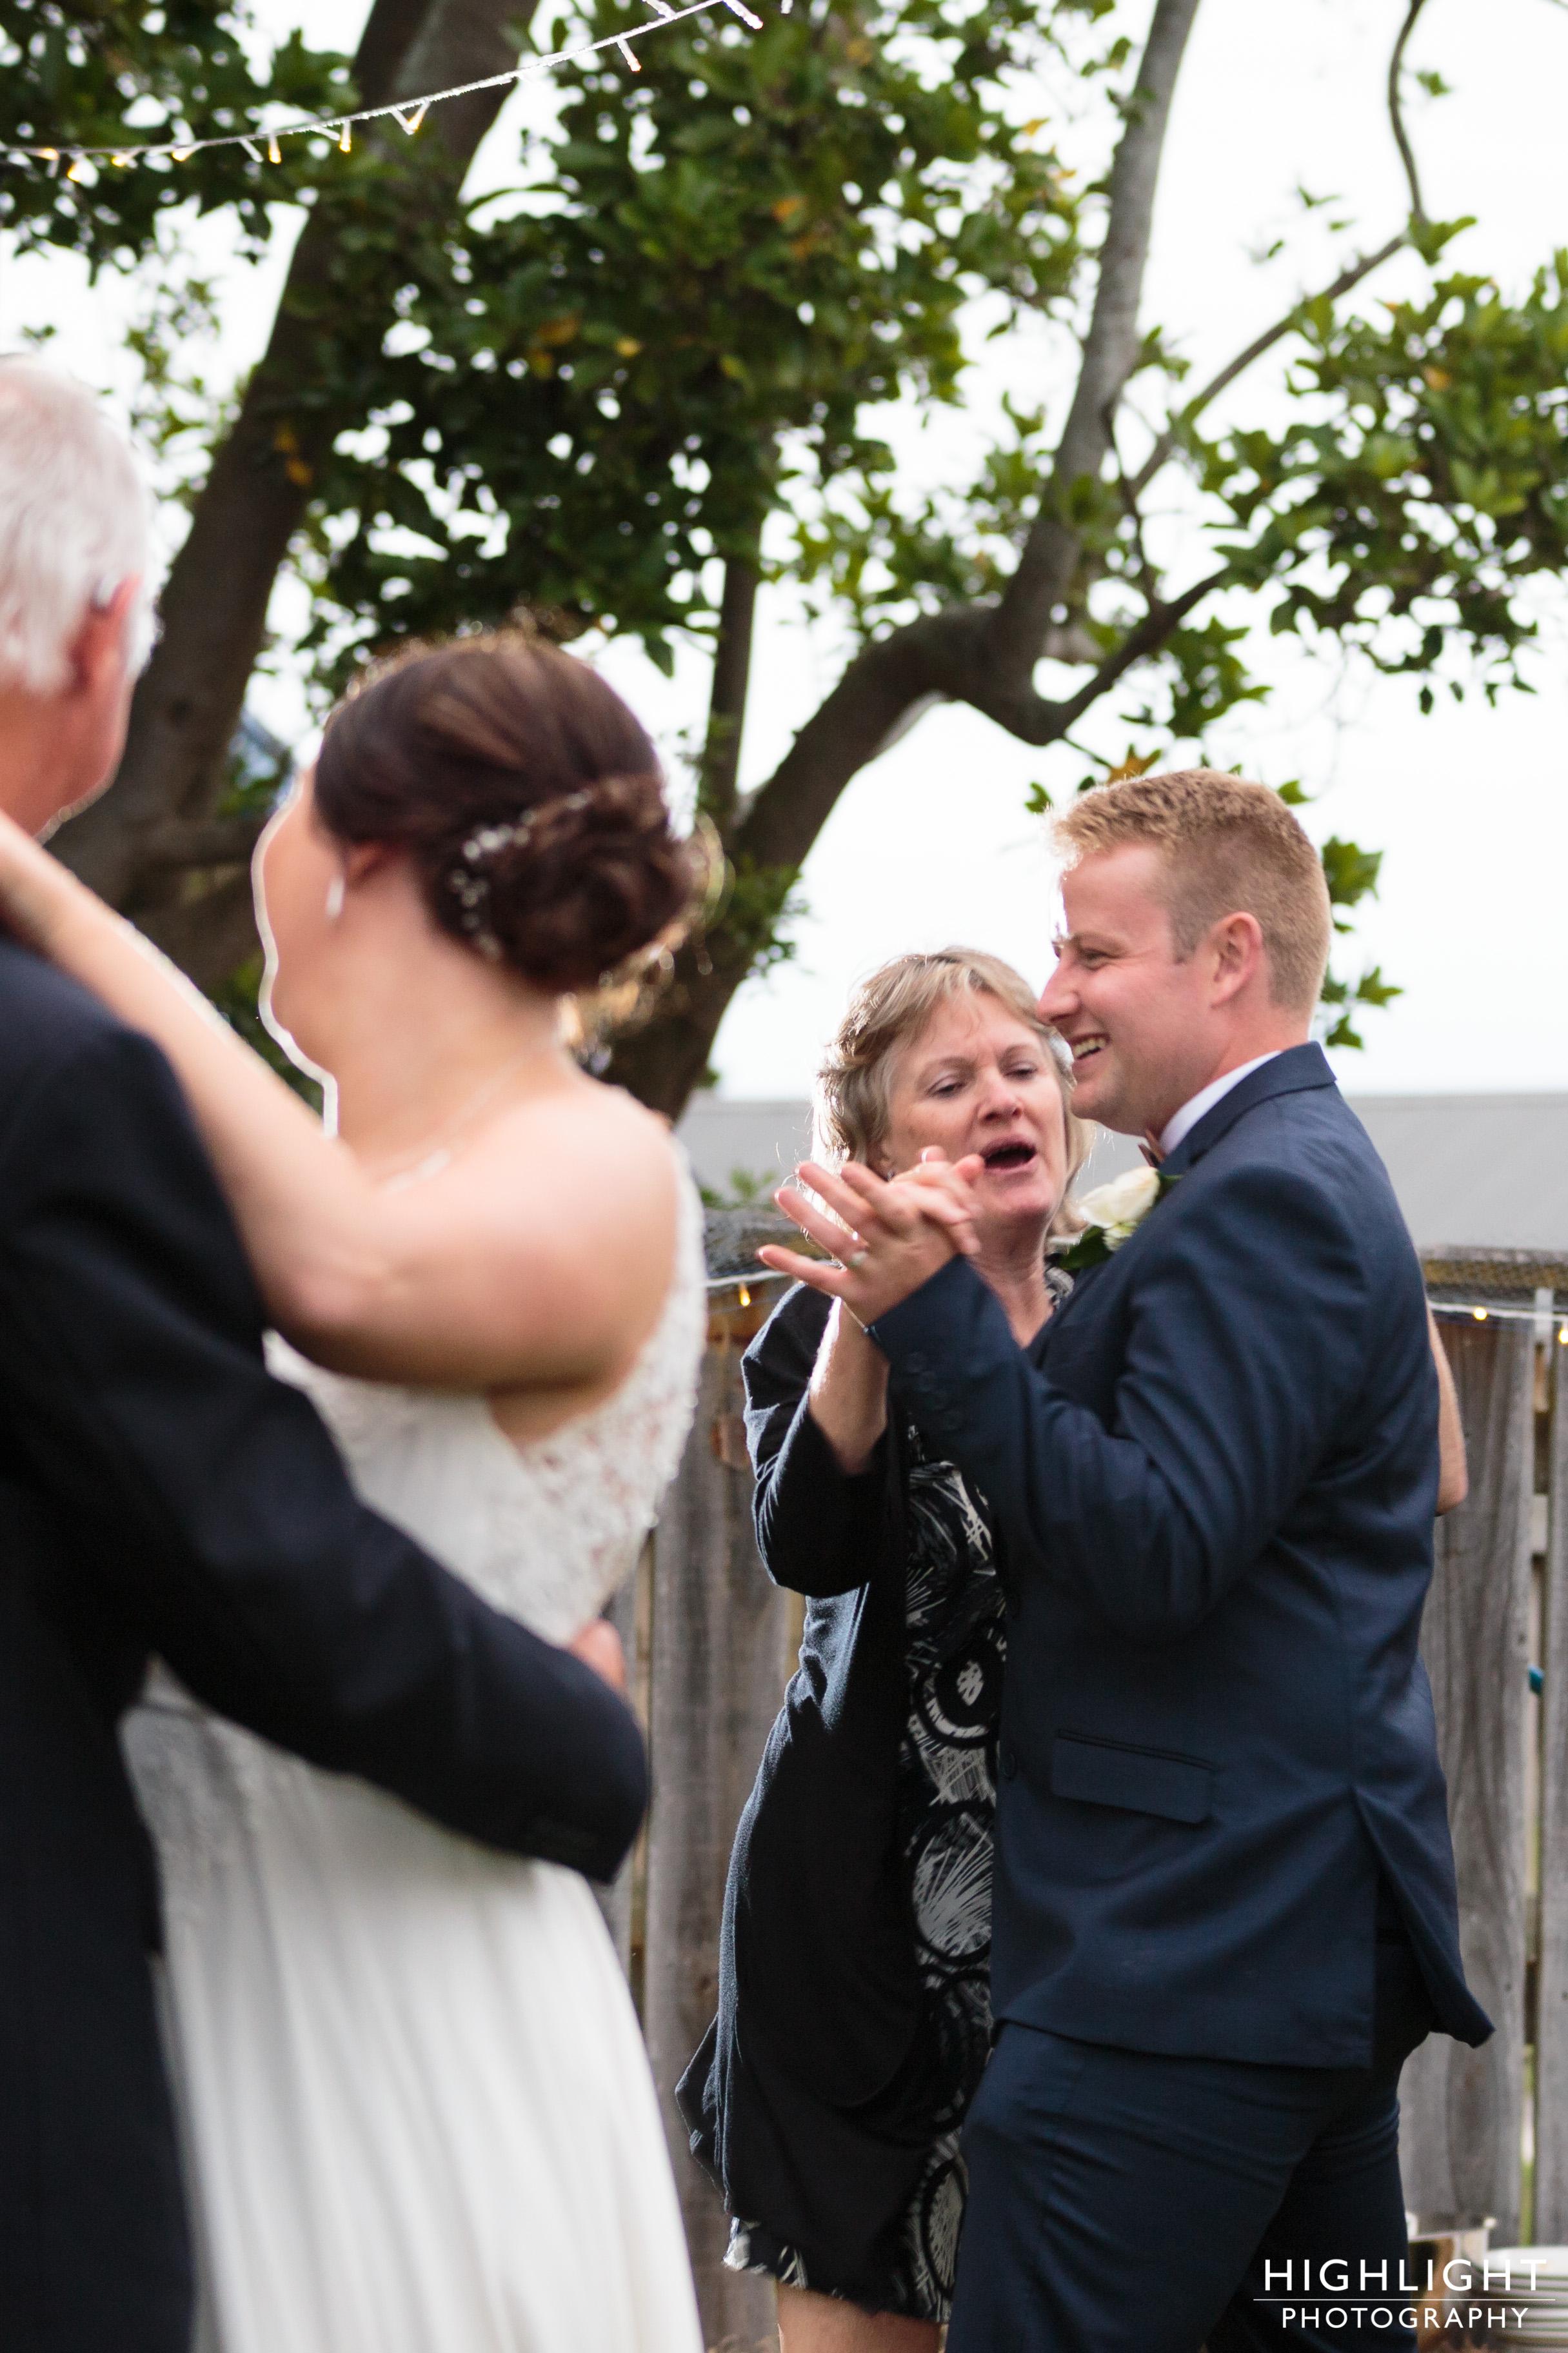 JM-2017-Highlight-wedding-photography-palmerston-north-new-zealand-219.jpg